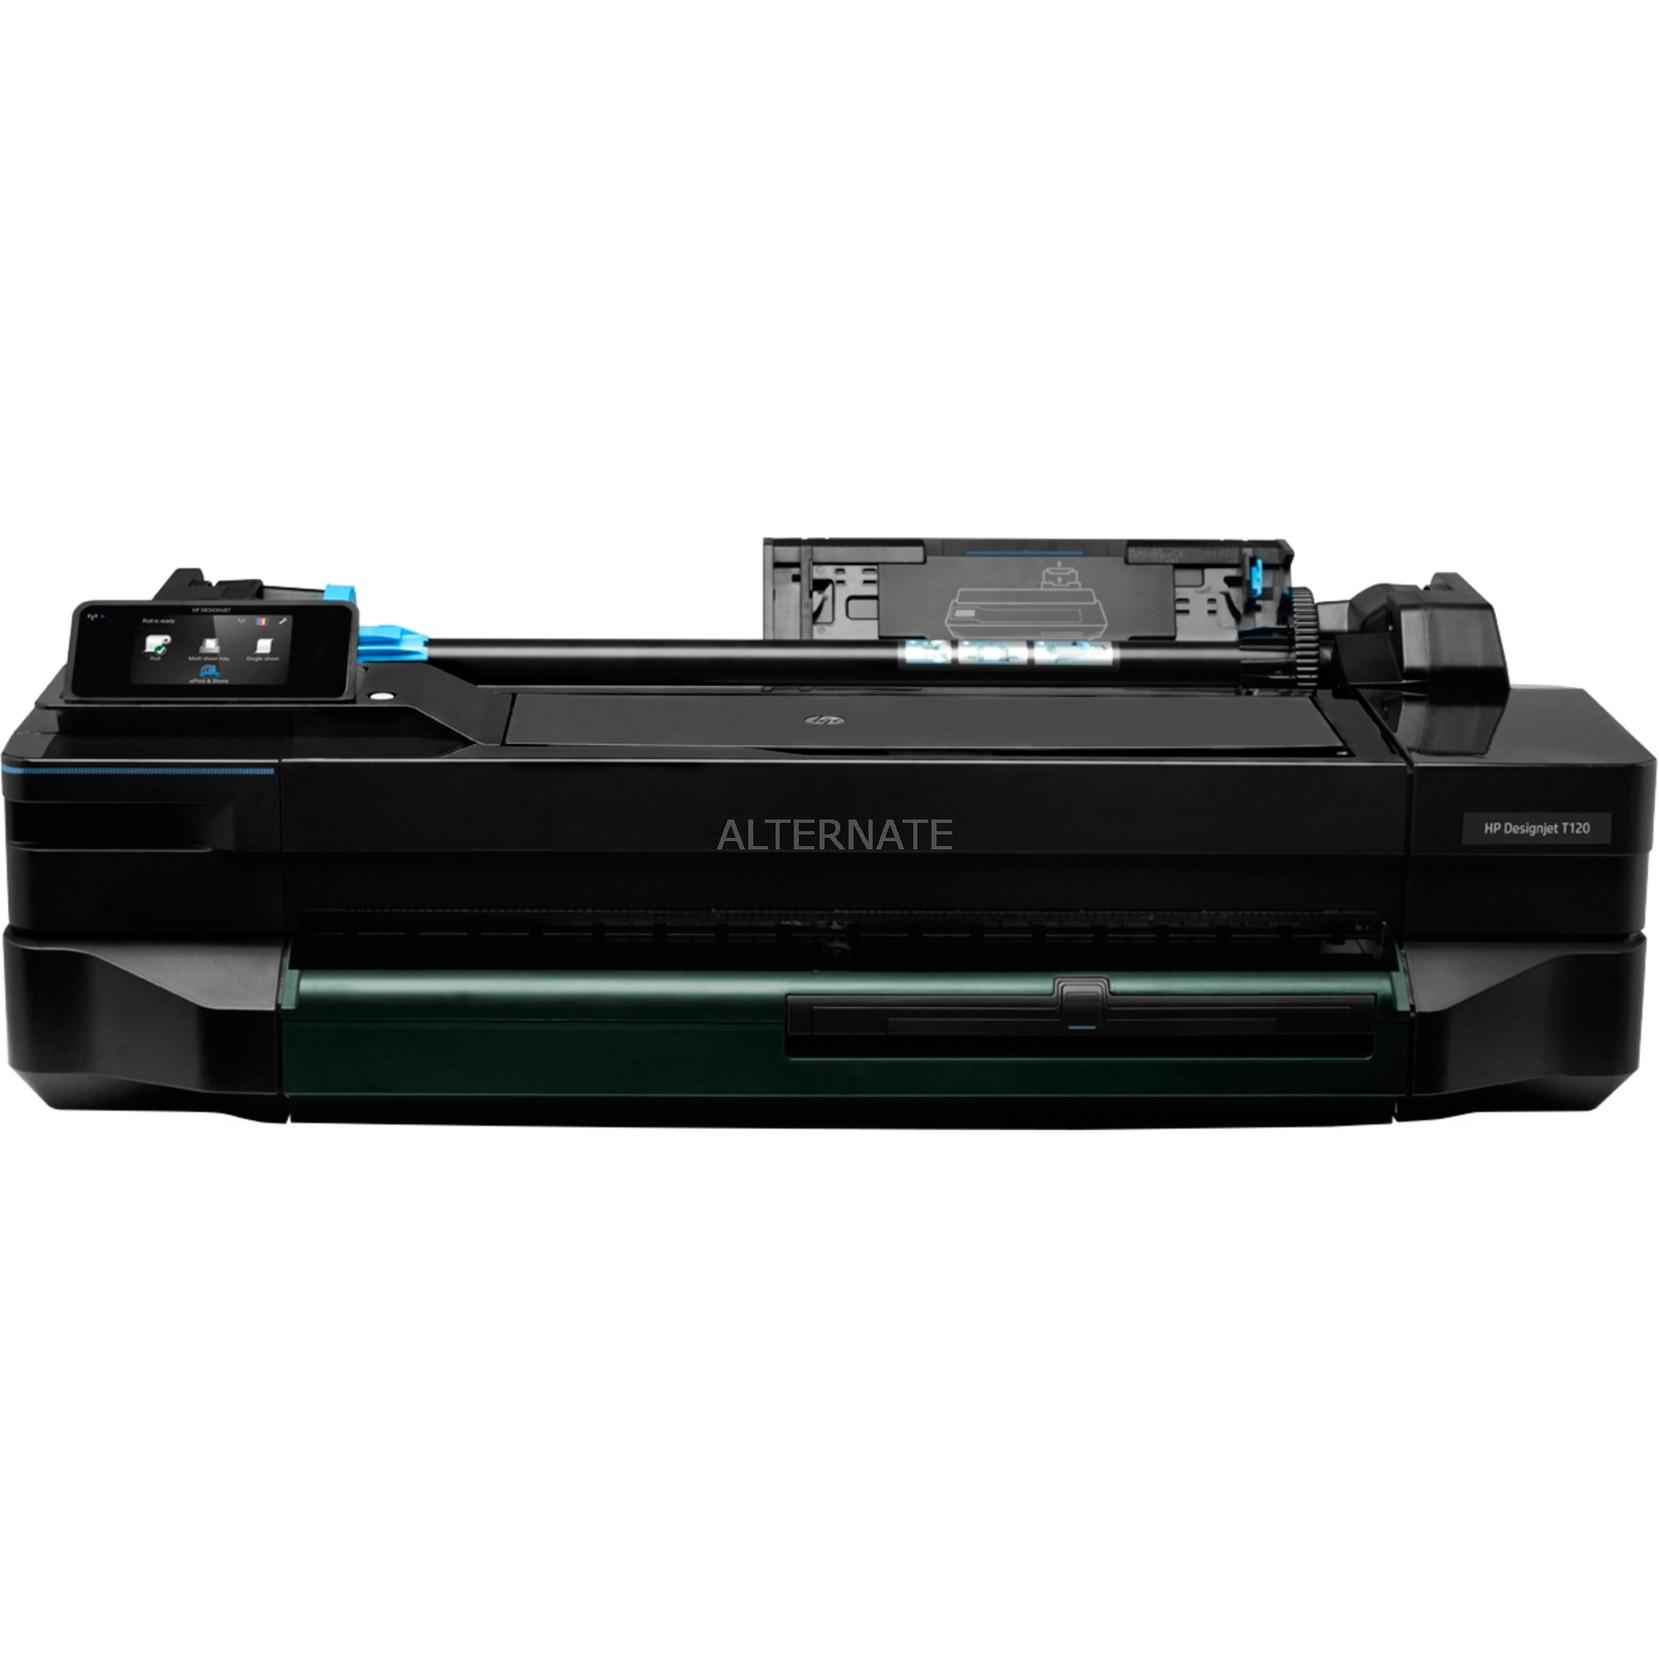 Designjet T120 impresora de gran formato Color 1200 x 1200 DPI Inyección de tinta térmica 610 x 1897 mm Wifi, Impresora de chorro de tinta